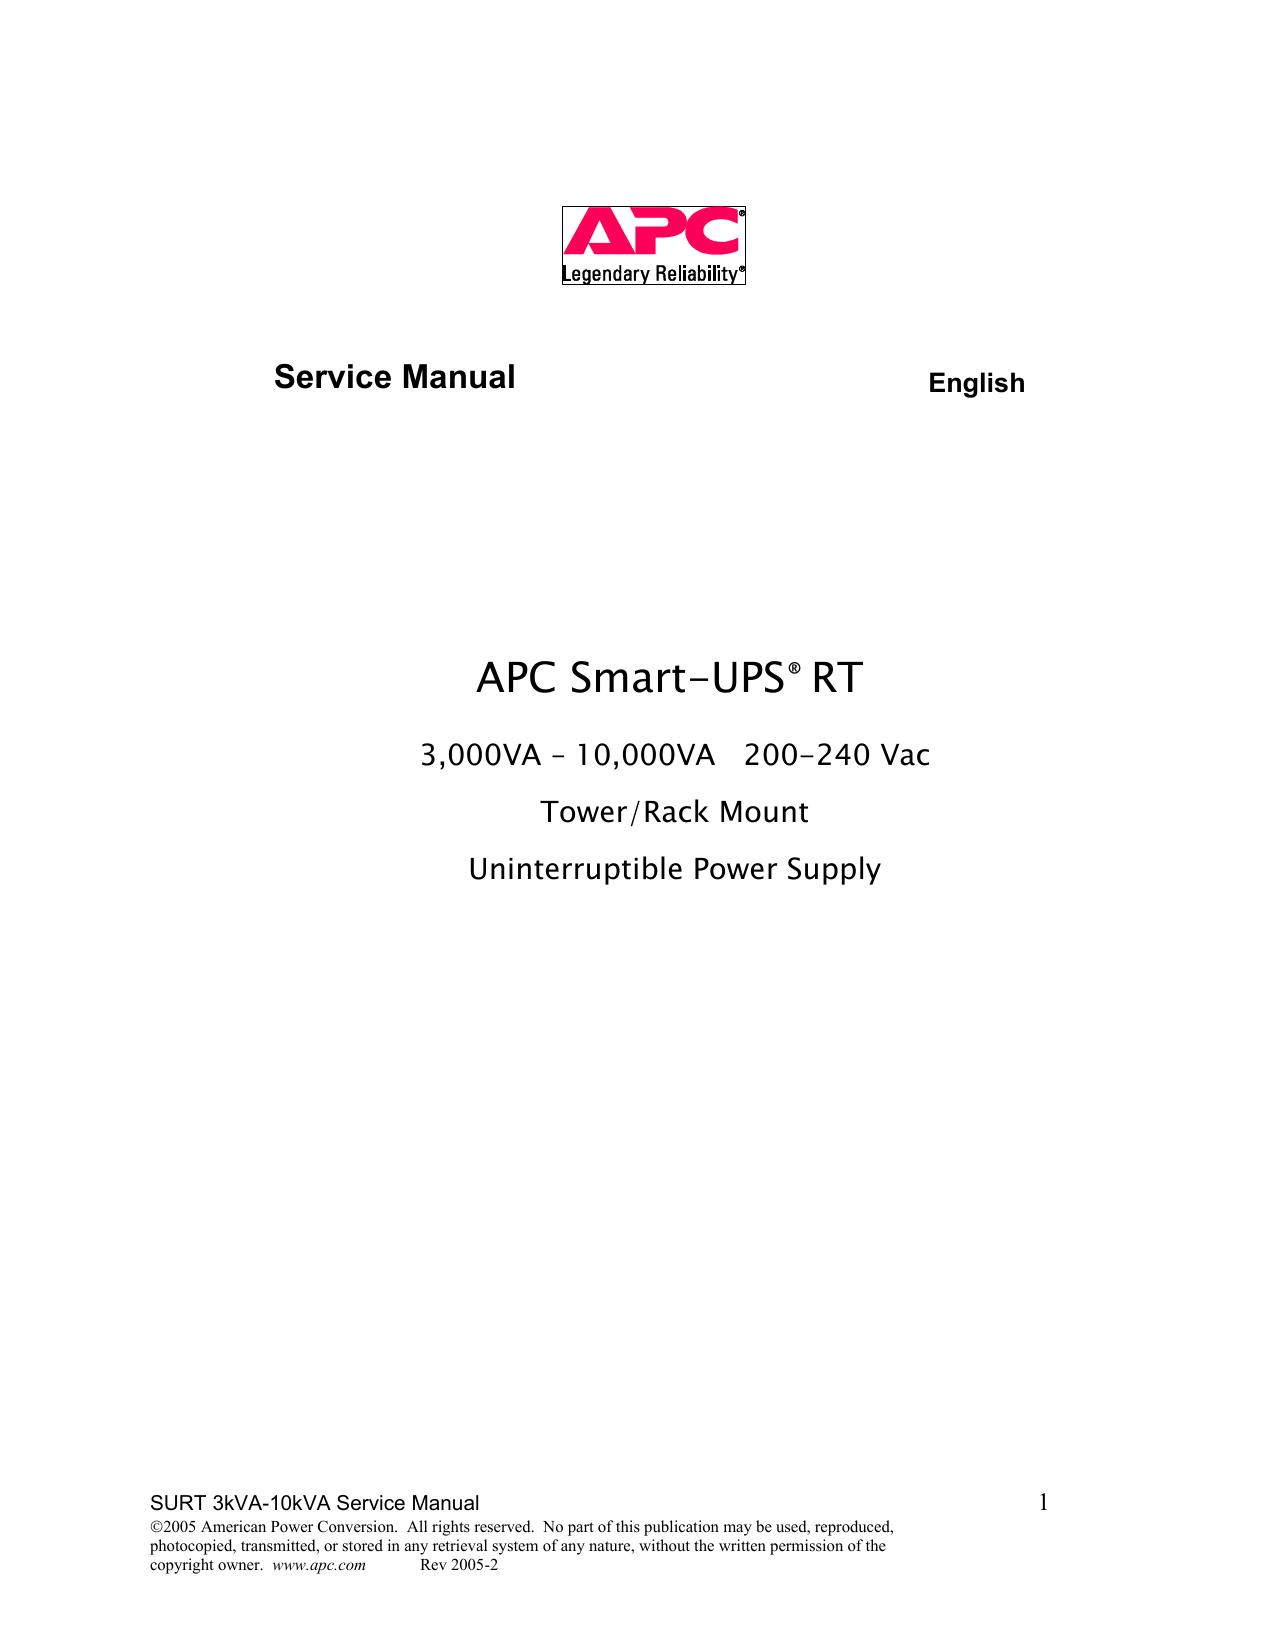 hight resolution of surt service manual rma rev2 apc